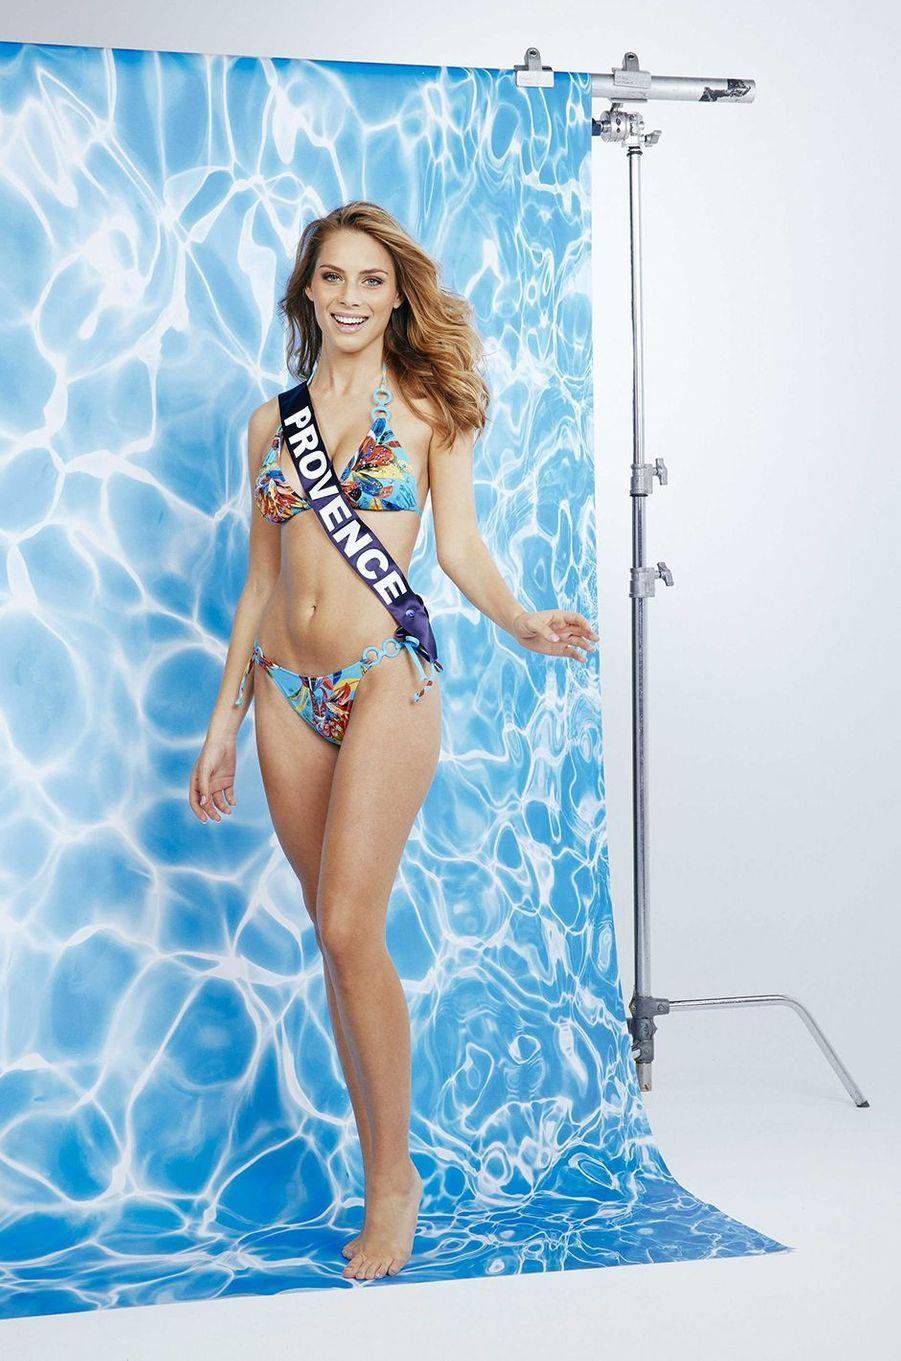 Miss Provence,April Benayoum